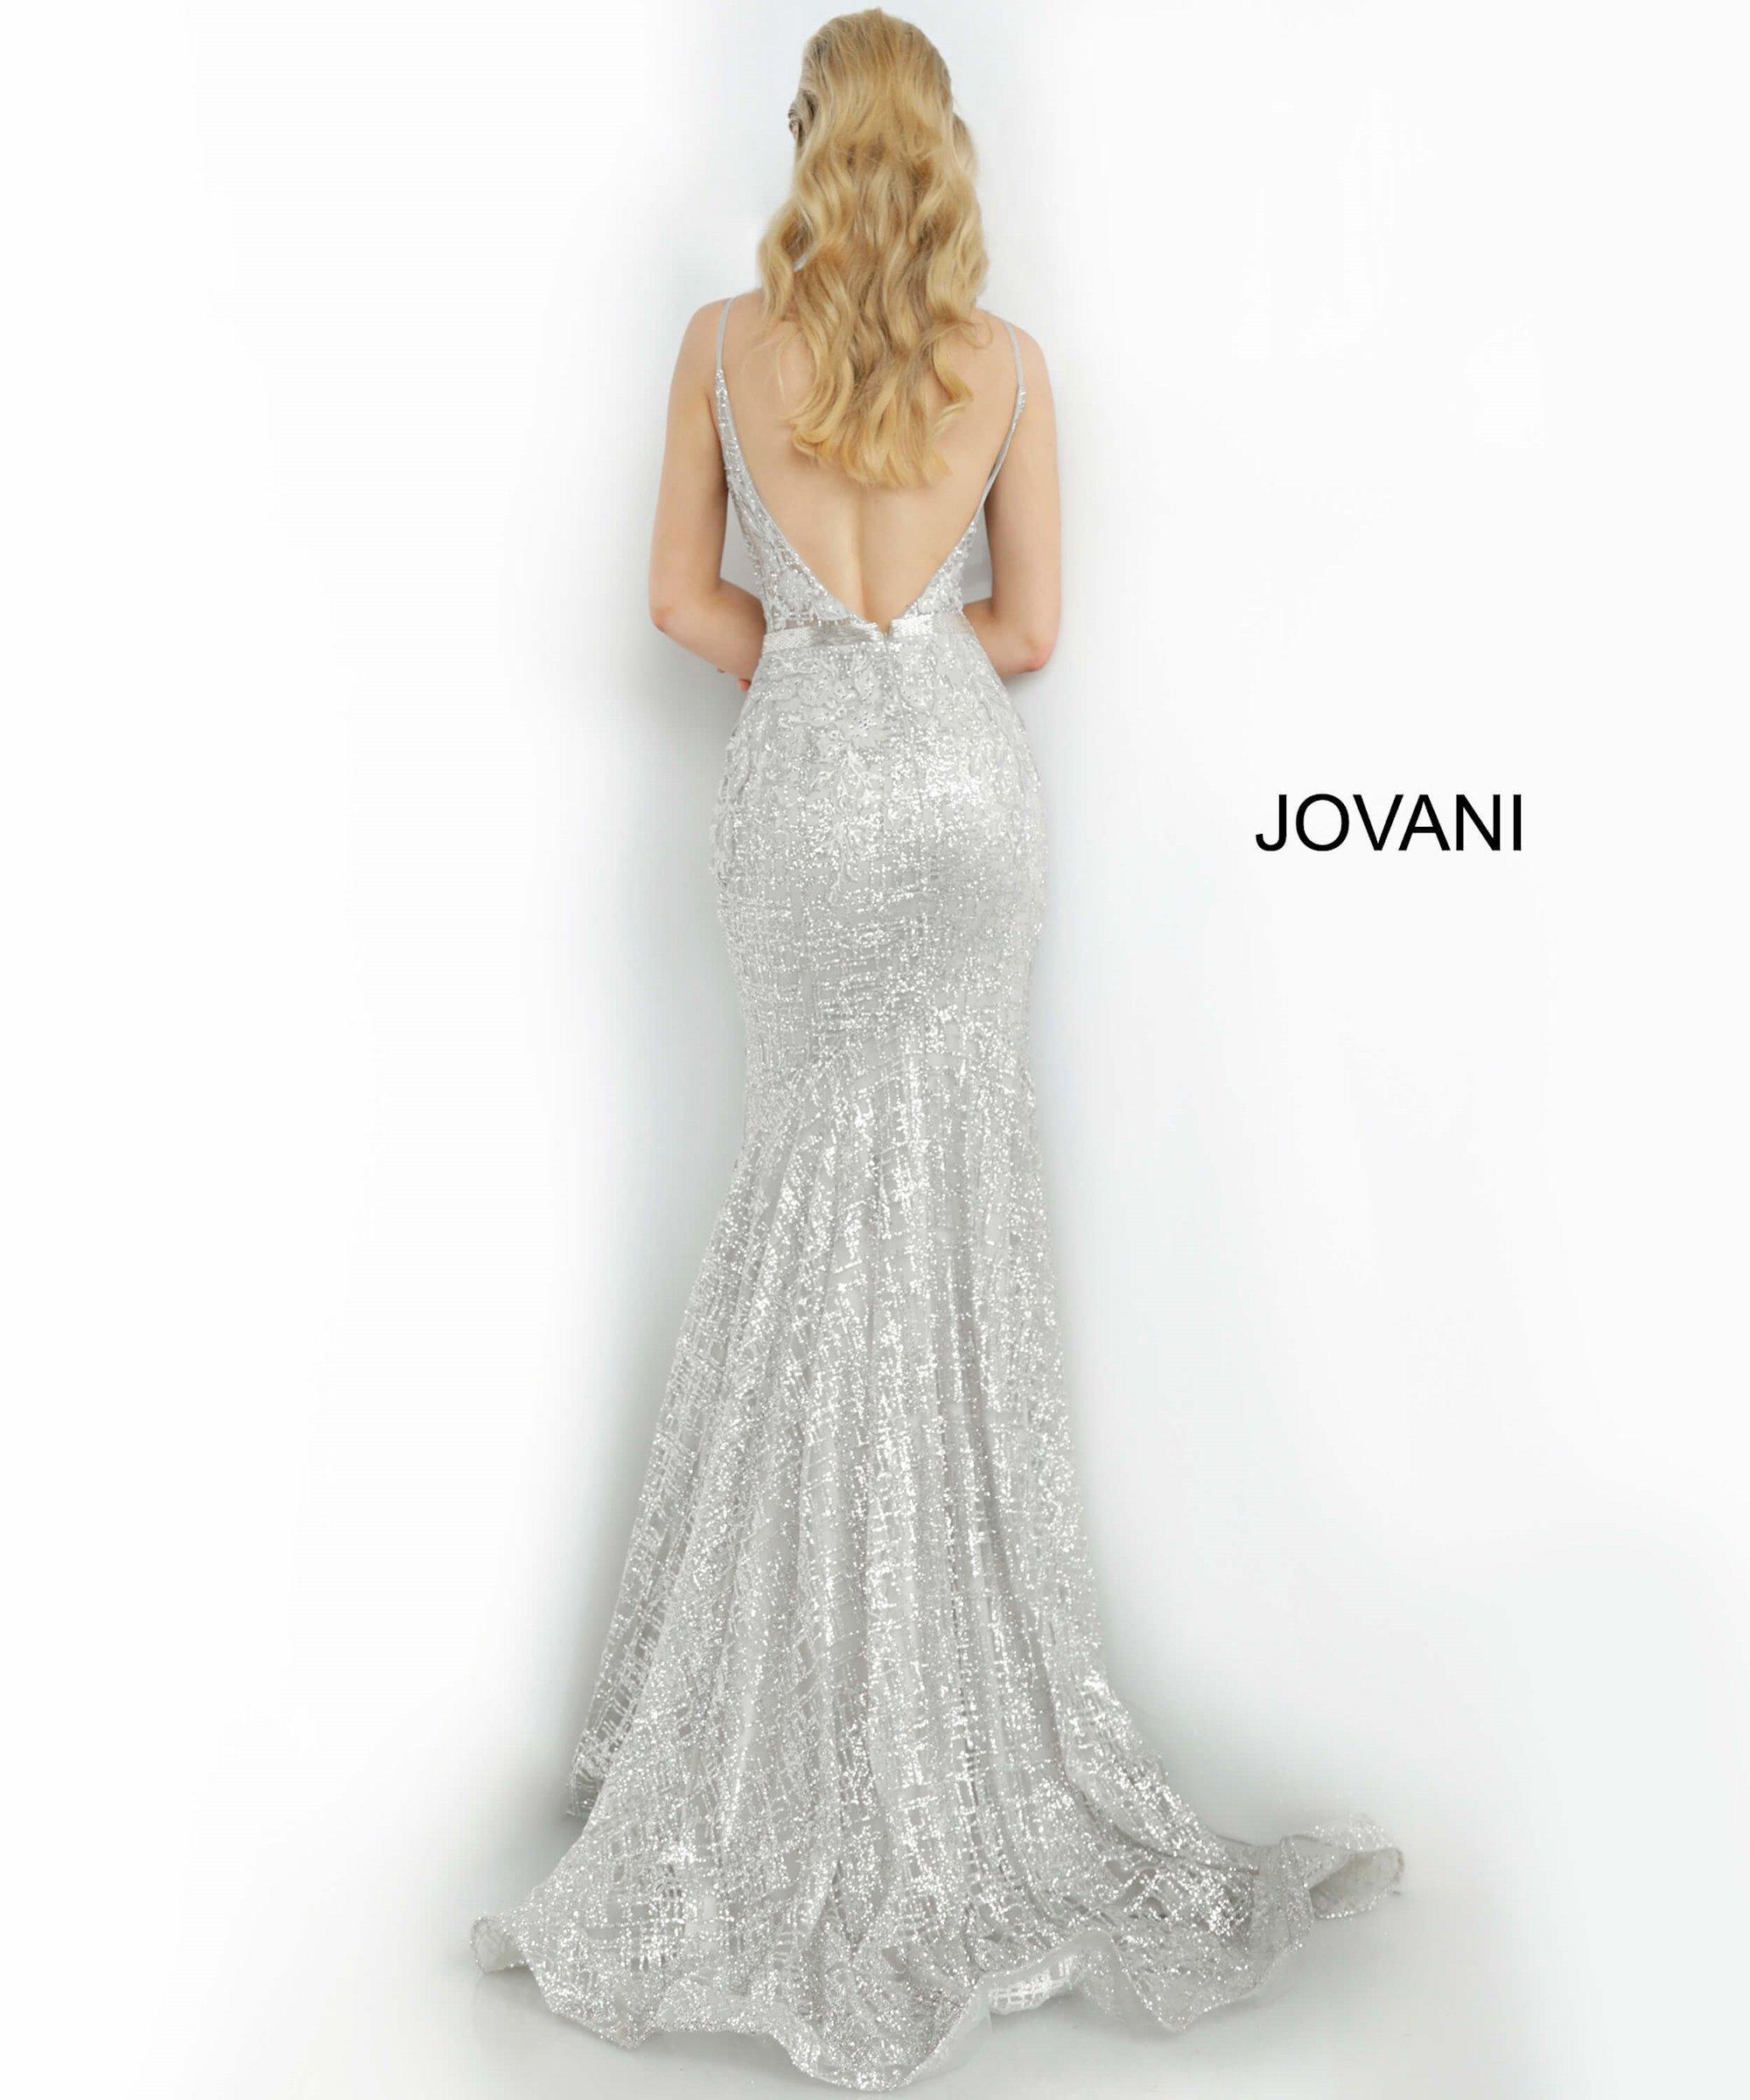 Jovani 62517 Regiss